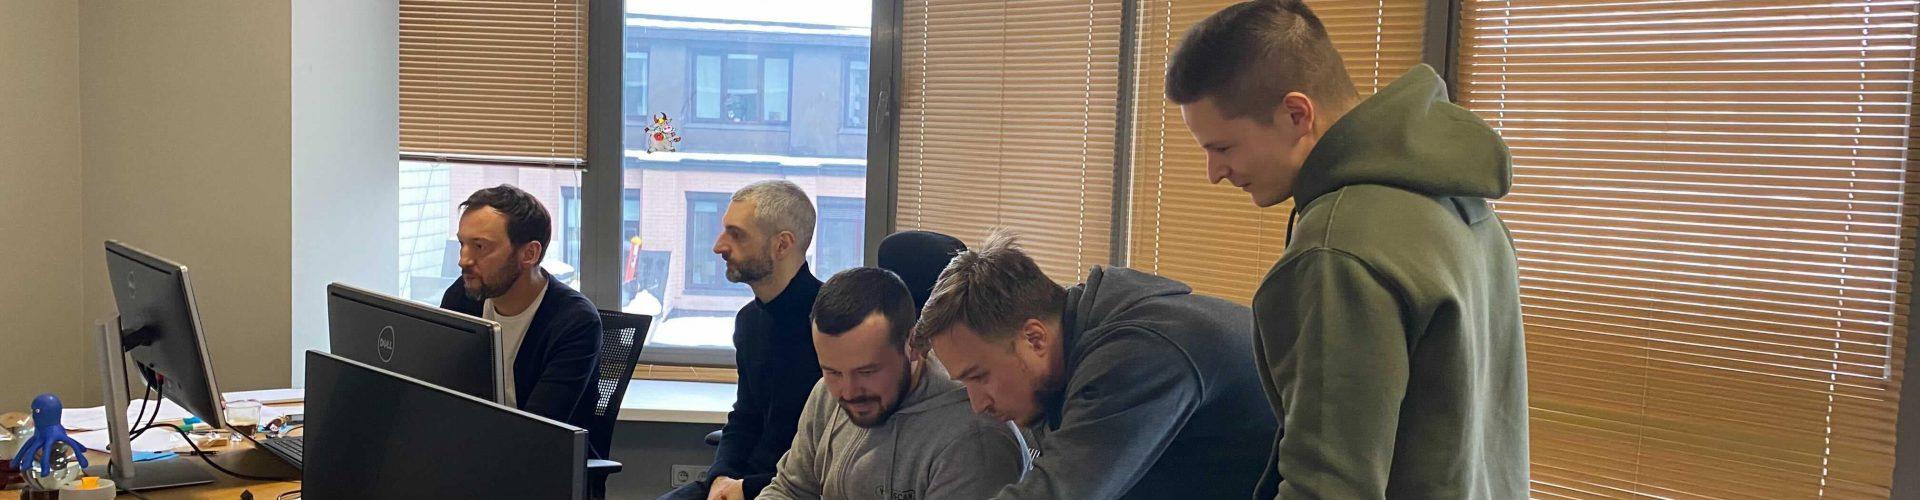 Development hackathon